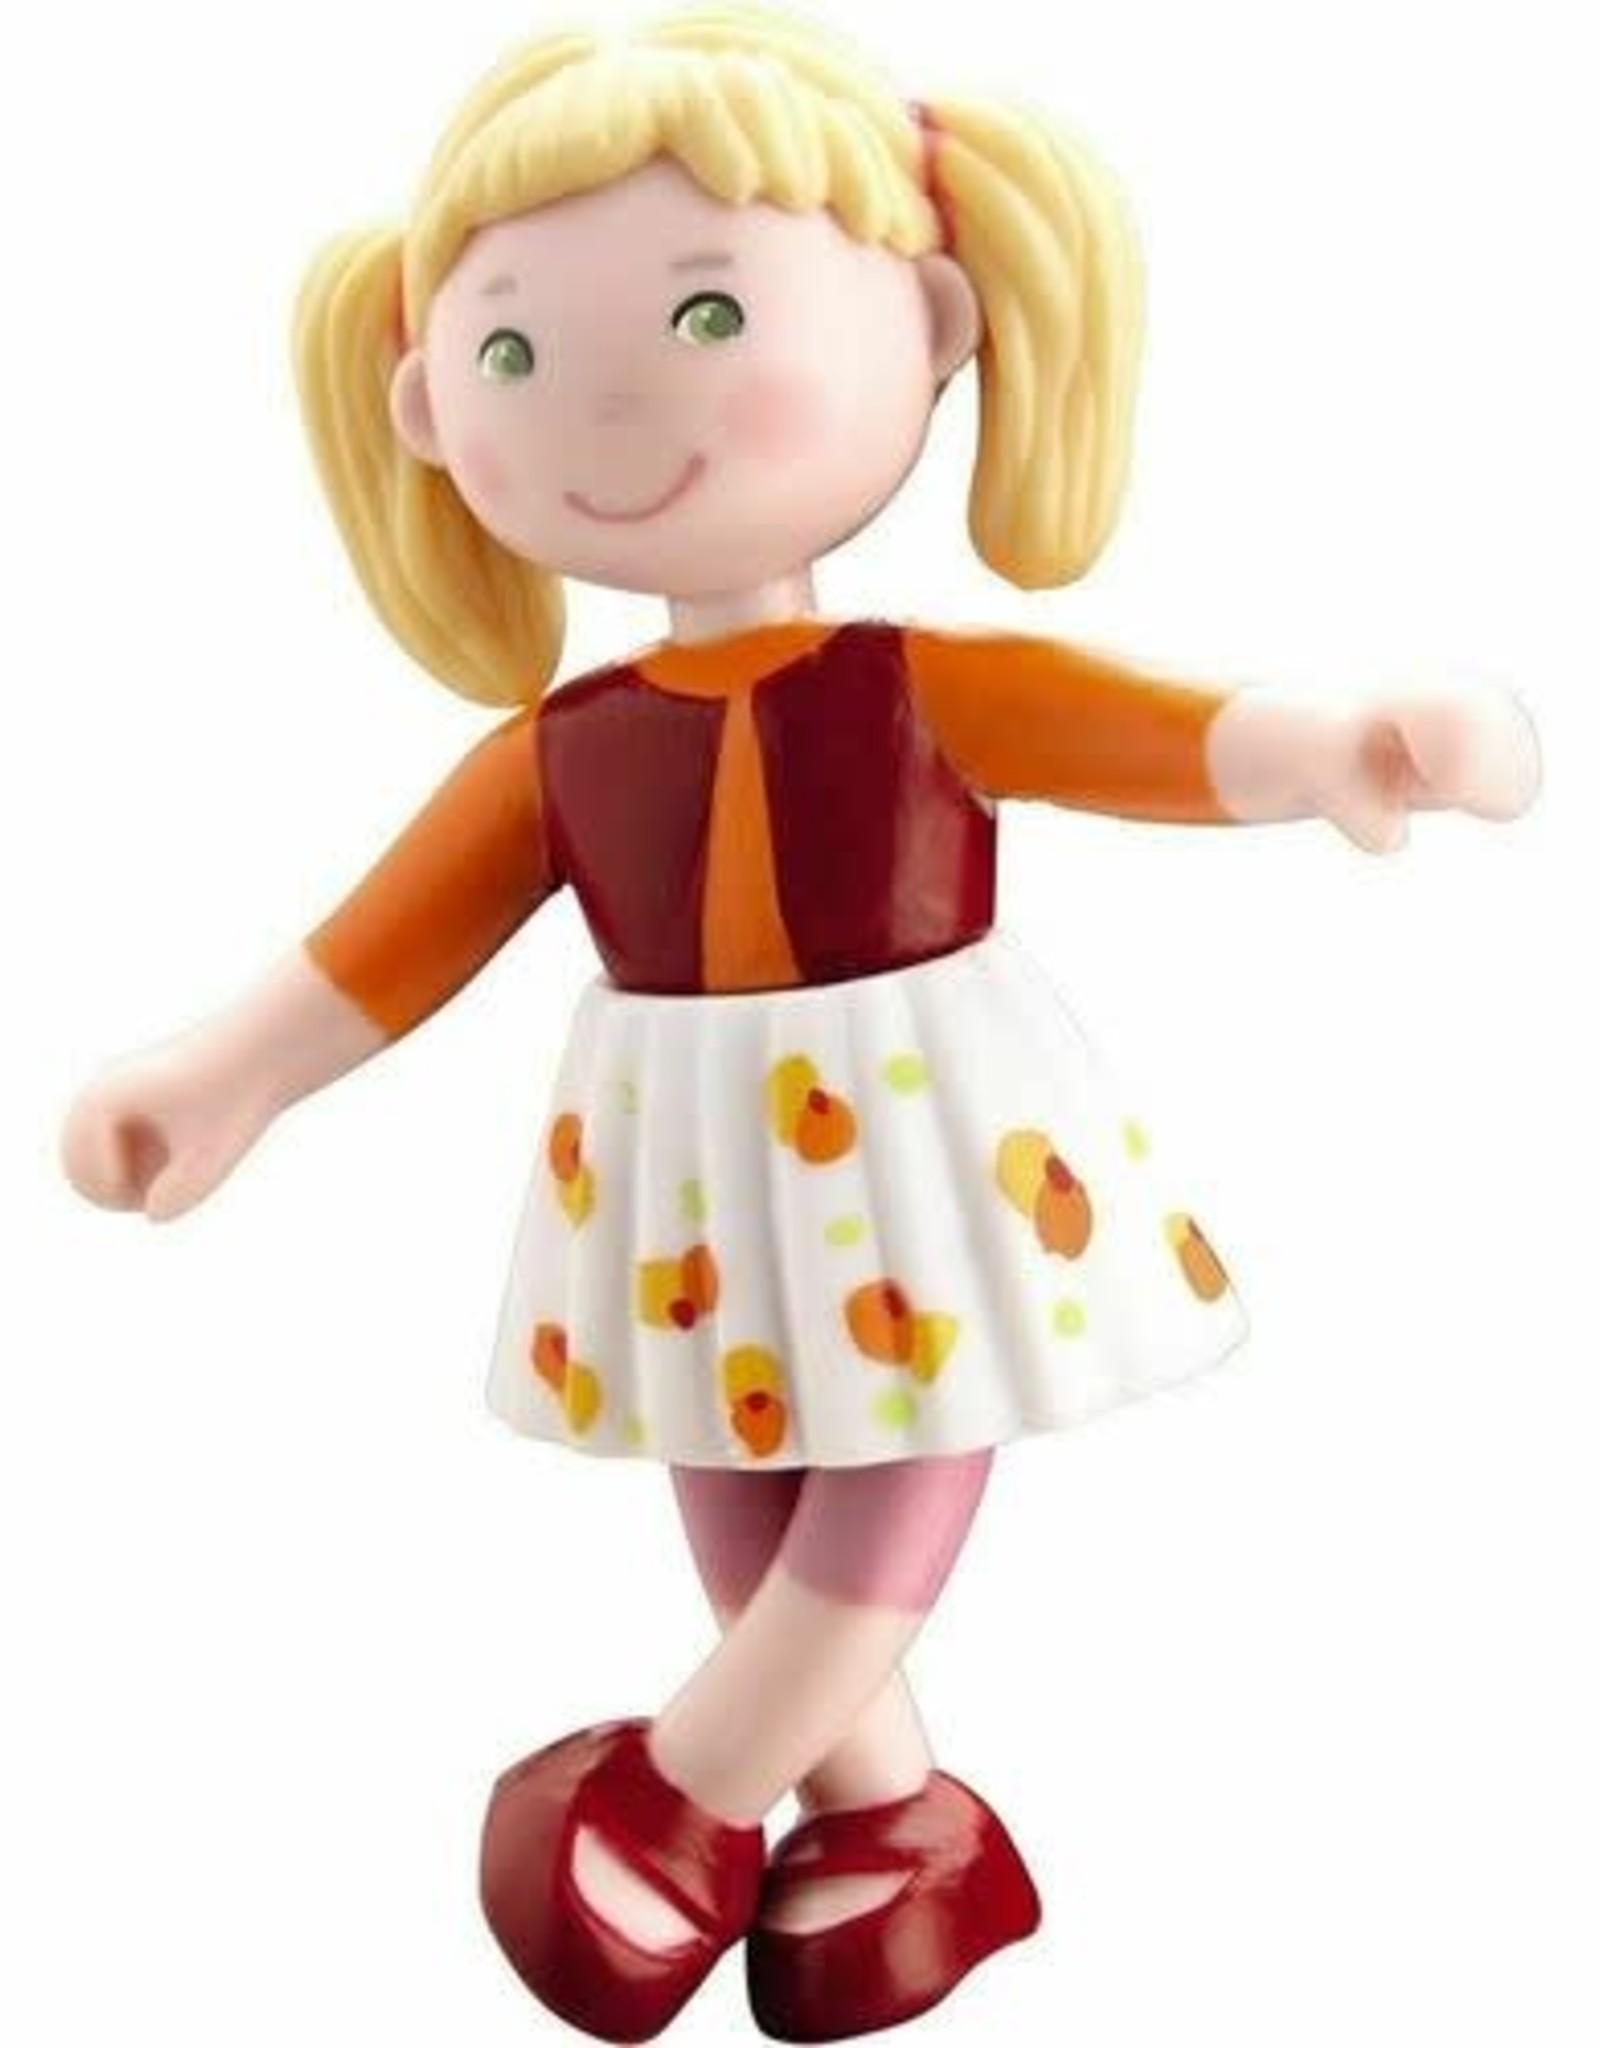 Haba LF Doll Milla